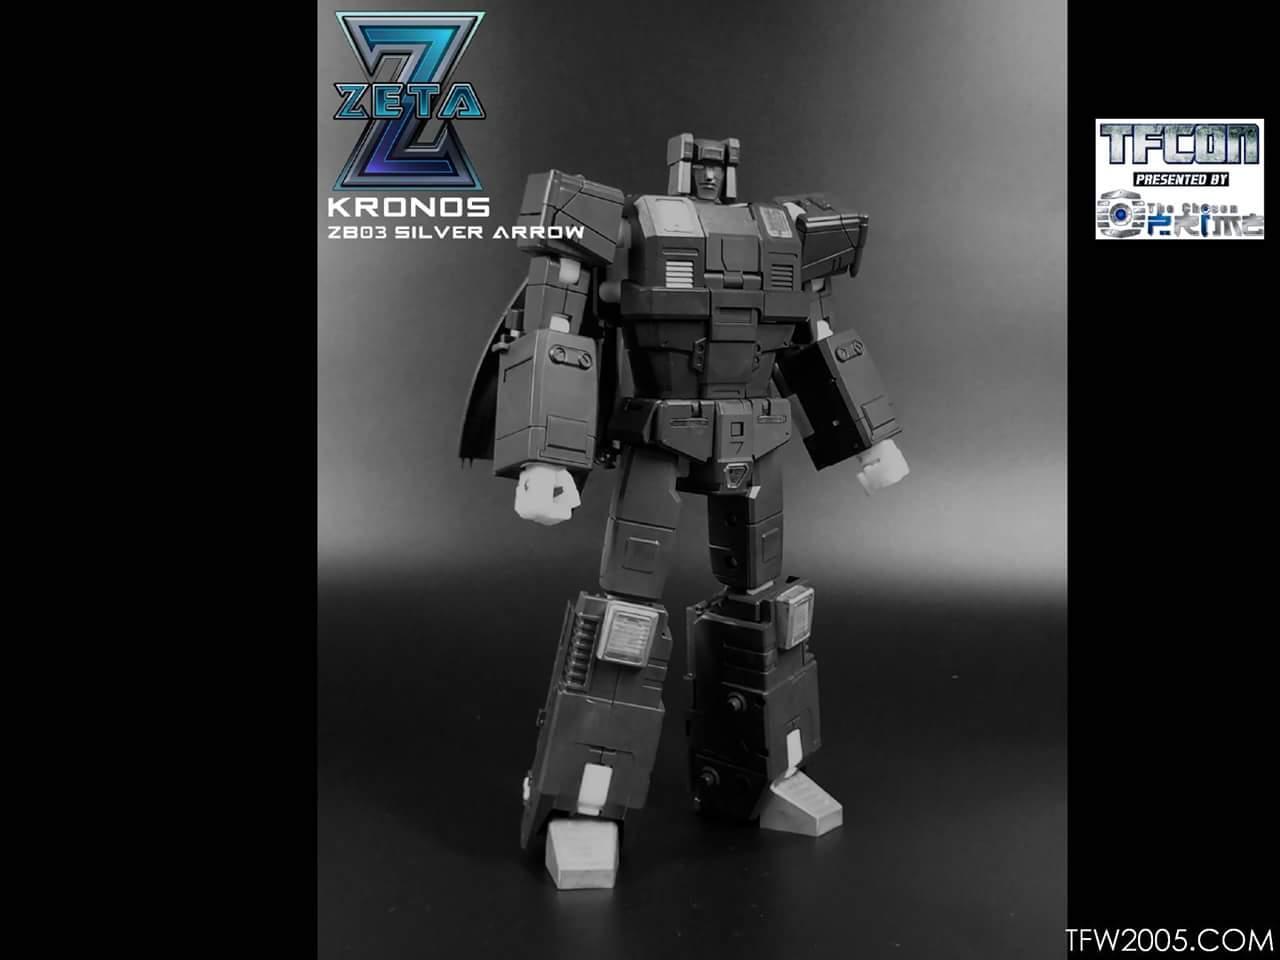 [Zeta Toys] Produit Tiers ― Kronos (ZB-01 à ZB-05) ― ZB-06|ZB-07 Superitron ― aka Superion - Page 2 YSDes3Vm_o